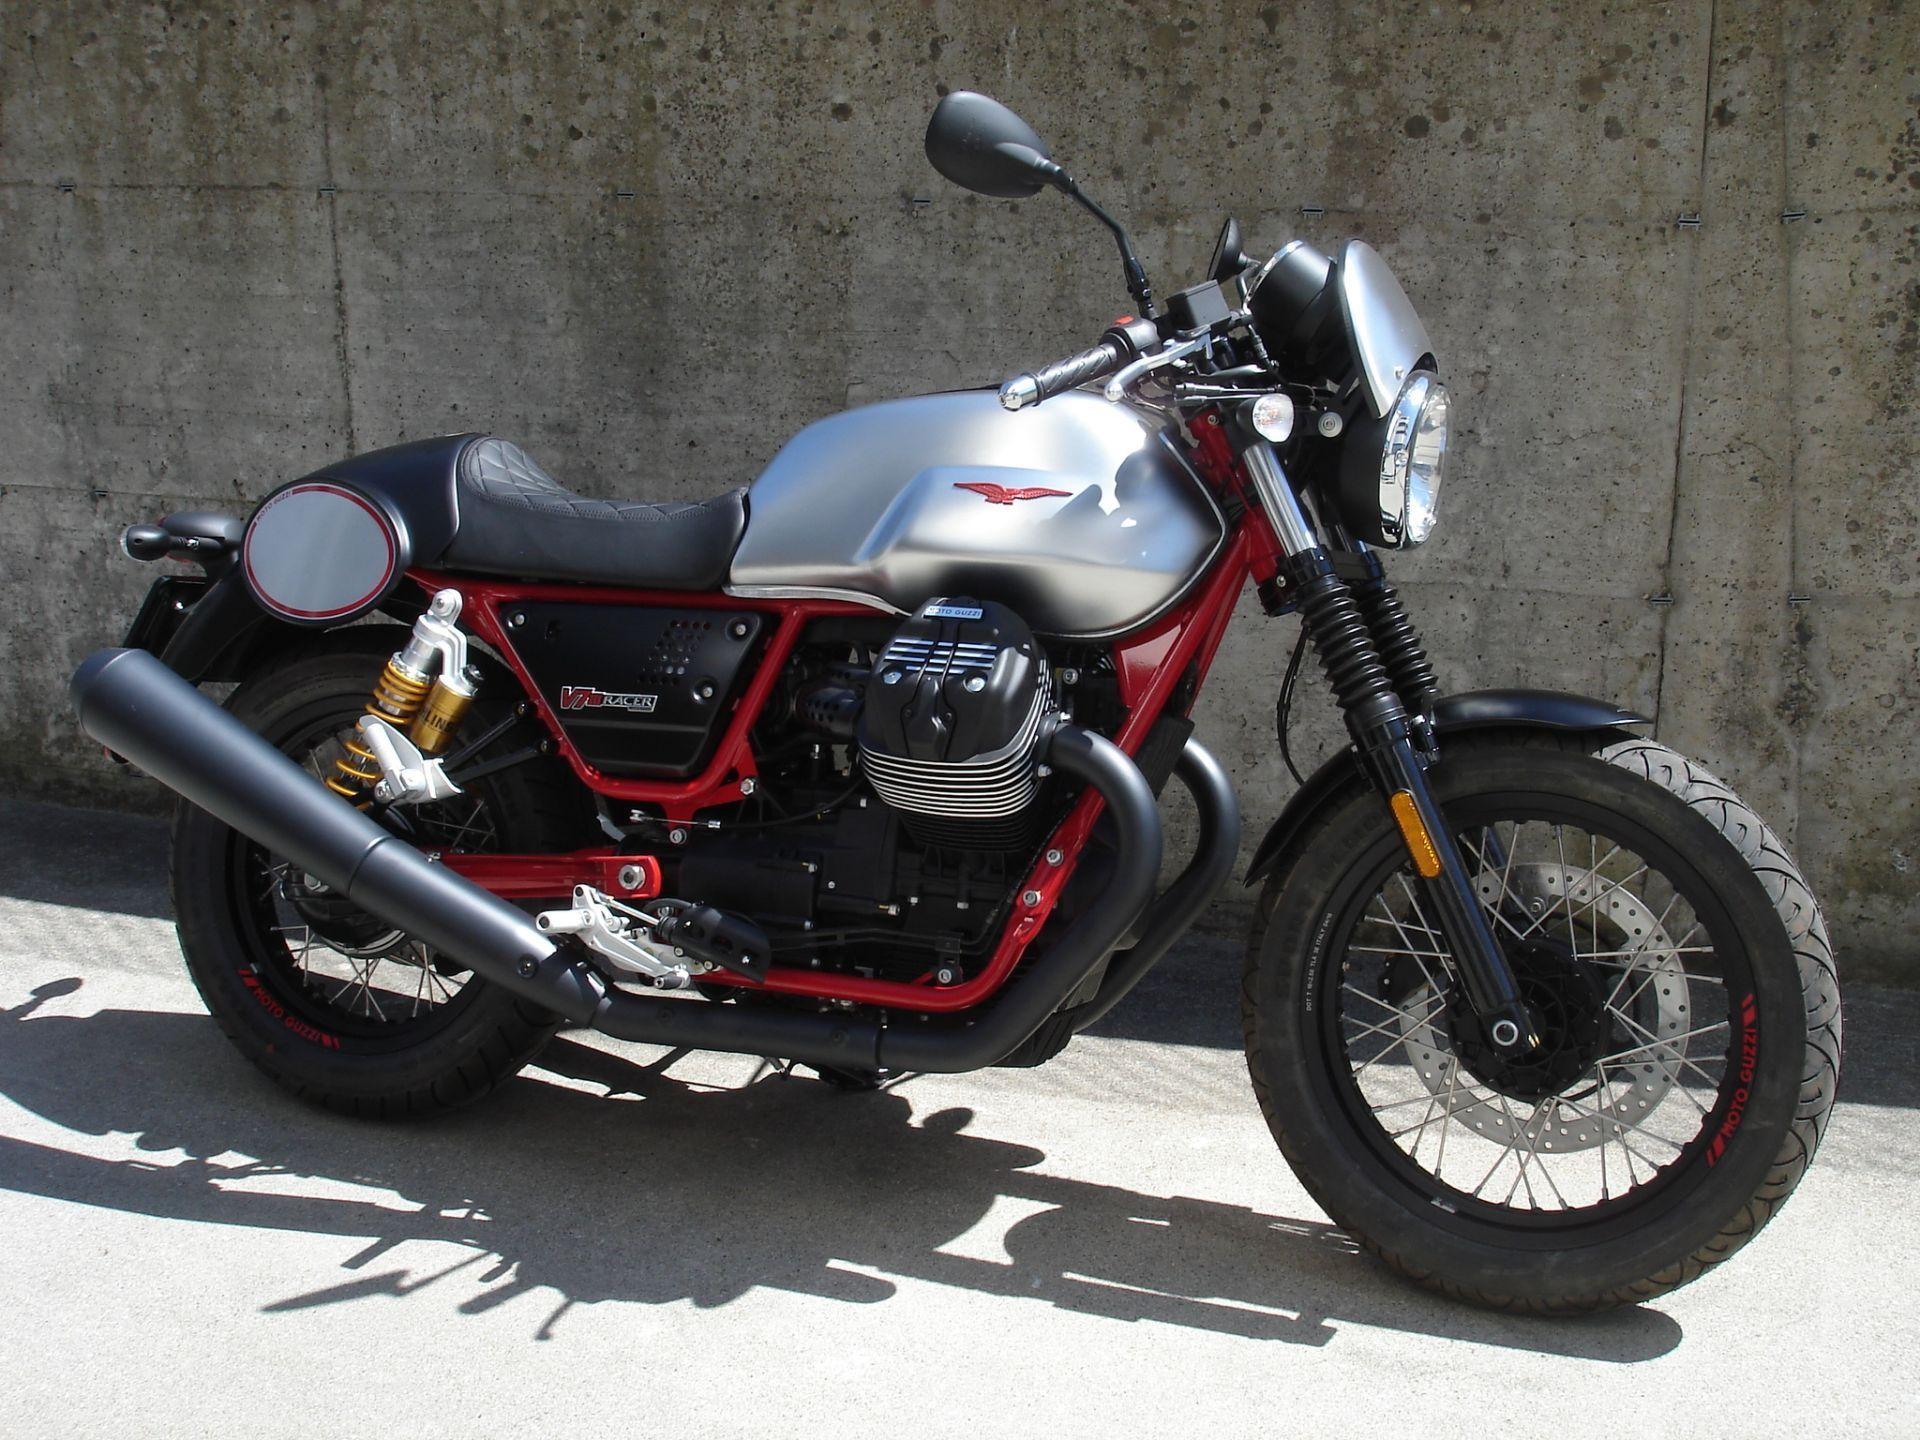 moto neuve acheter moto guzzi v7 iii racer la guzzi baar sihlbrugg. Black Bedroom Furniture Sets. Home Design Ideas